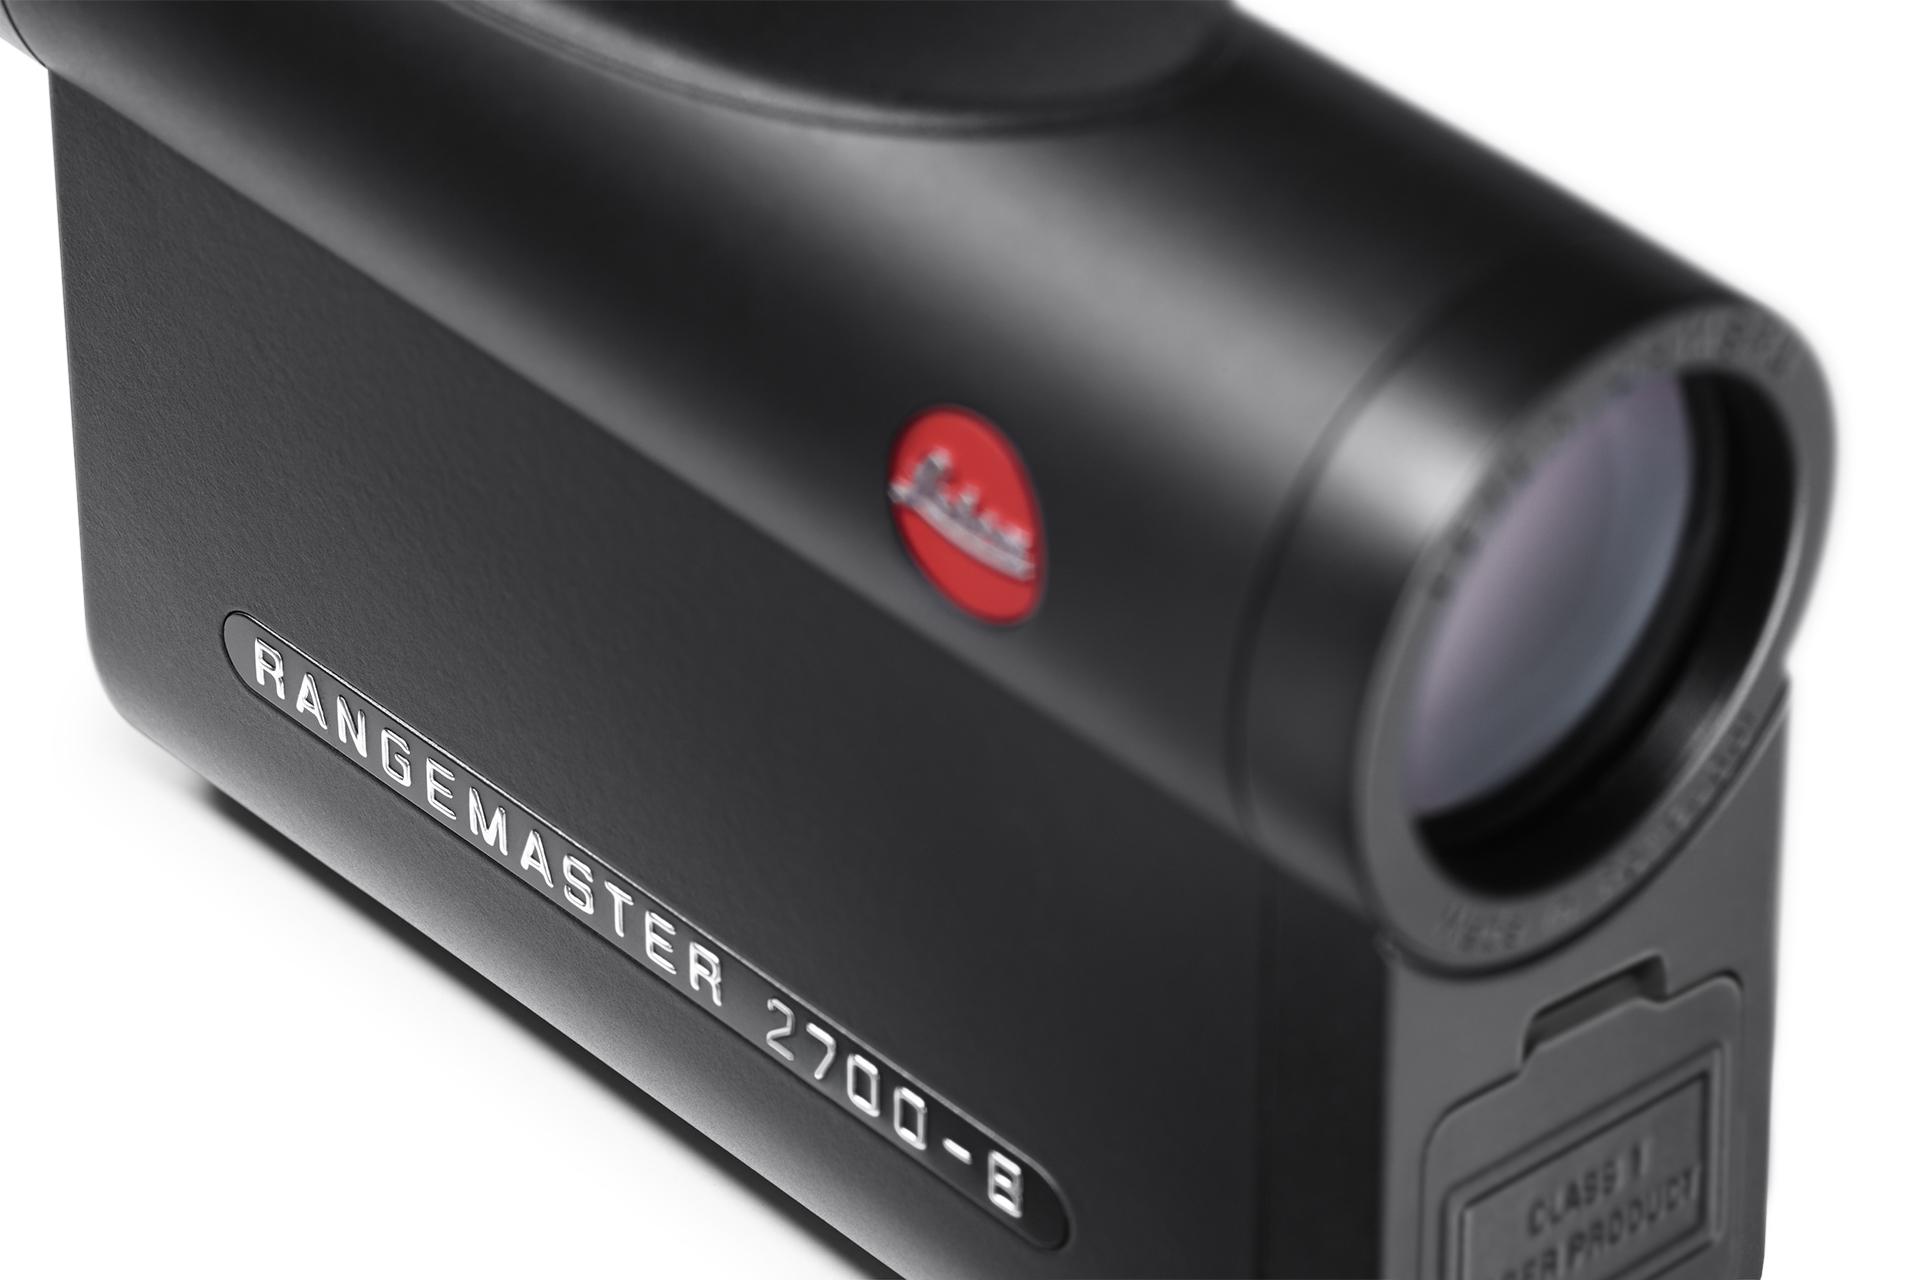 Leica Entfernungsmesser Crf 2000 B : Leica rangemaster crf b entfernungsmesser